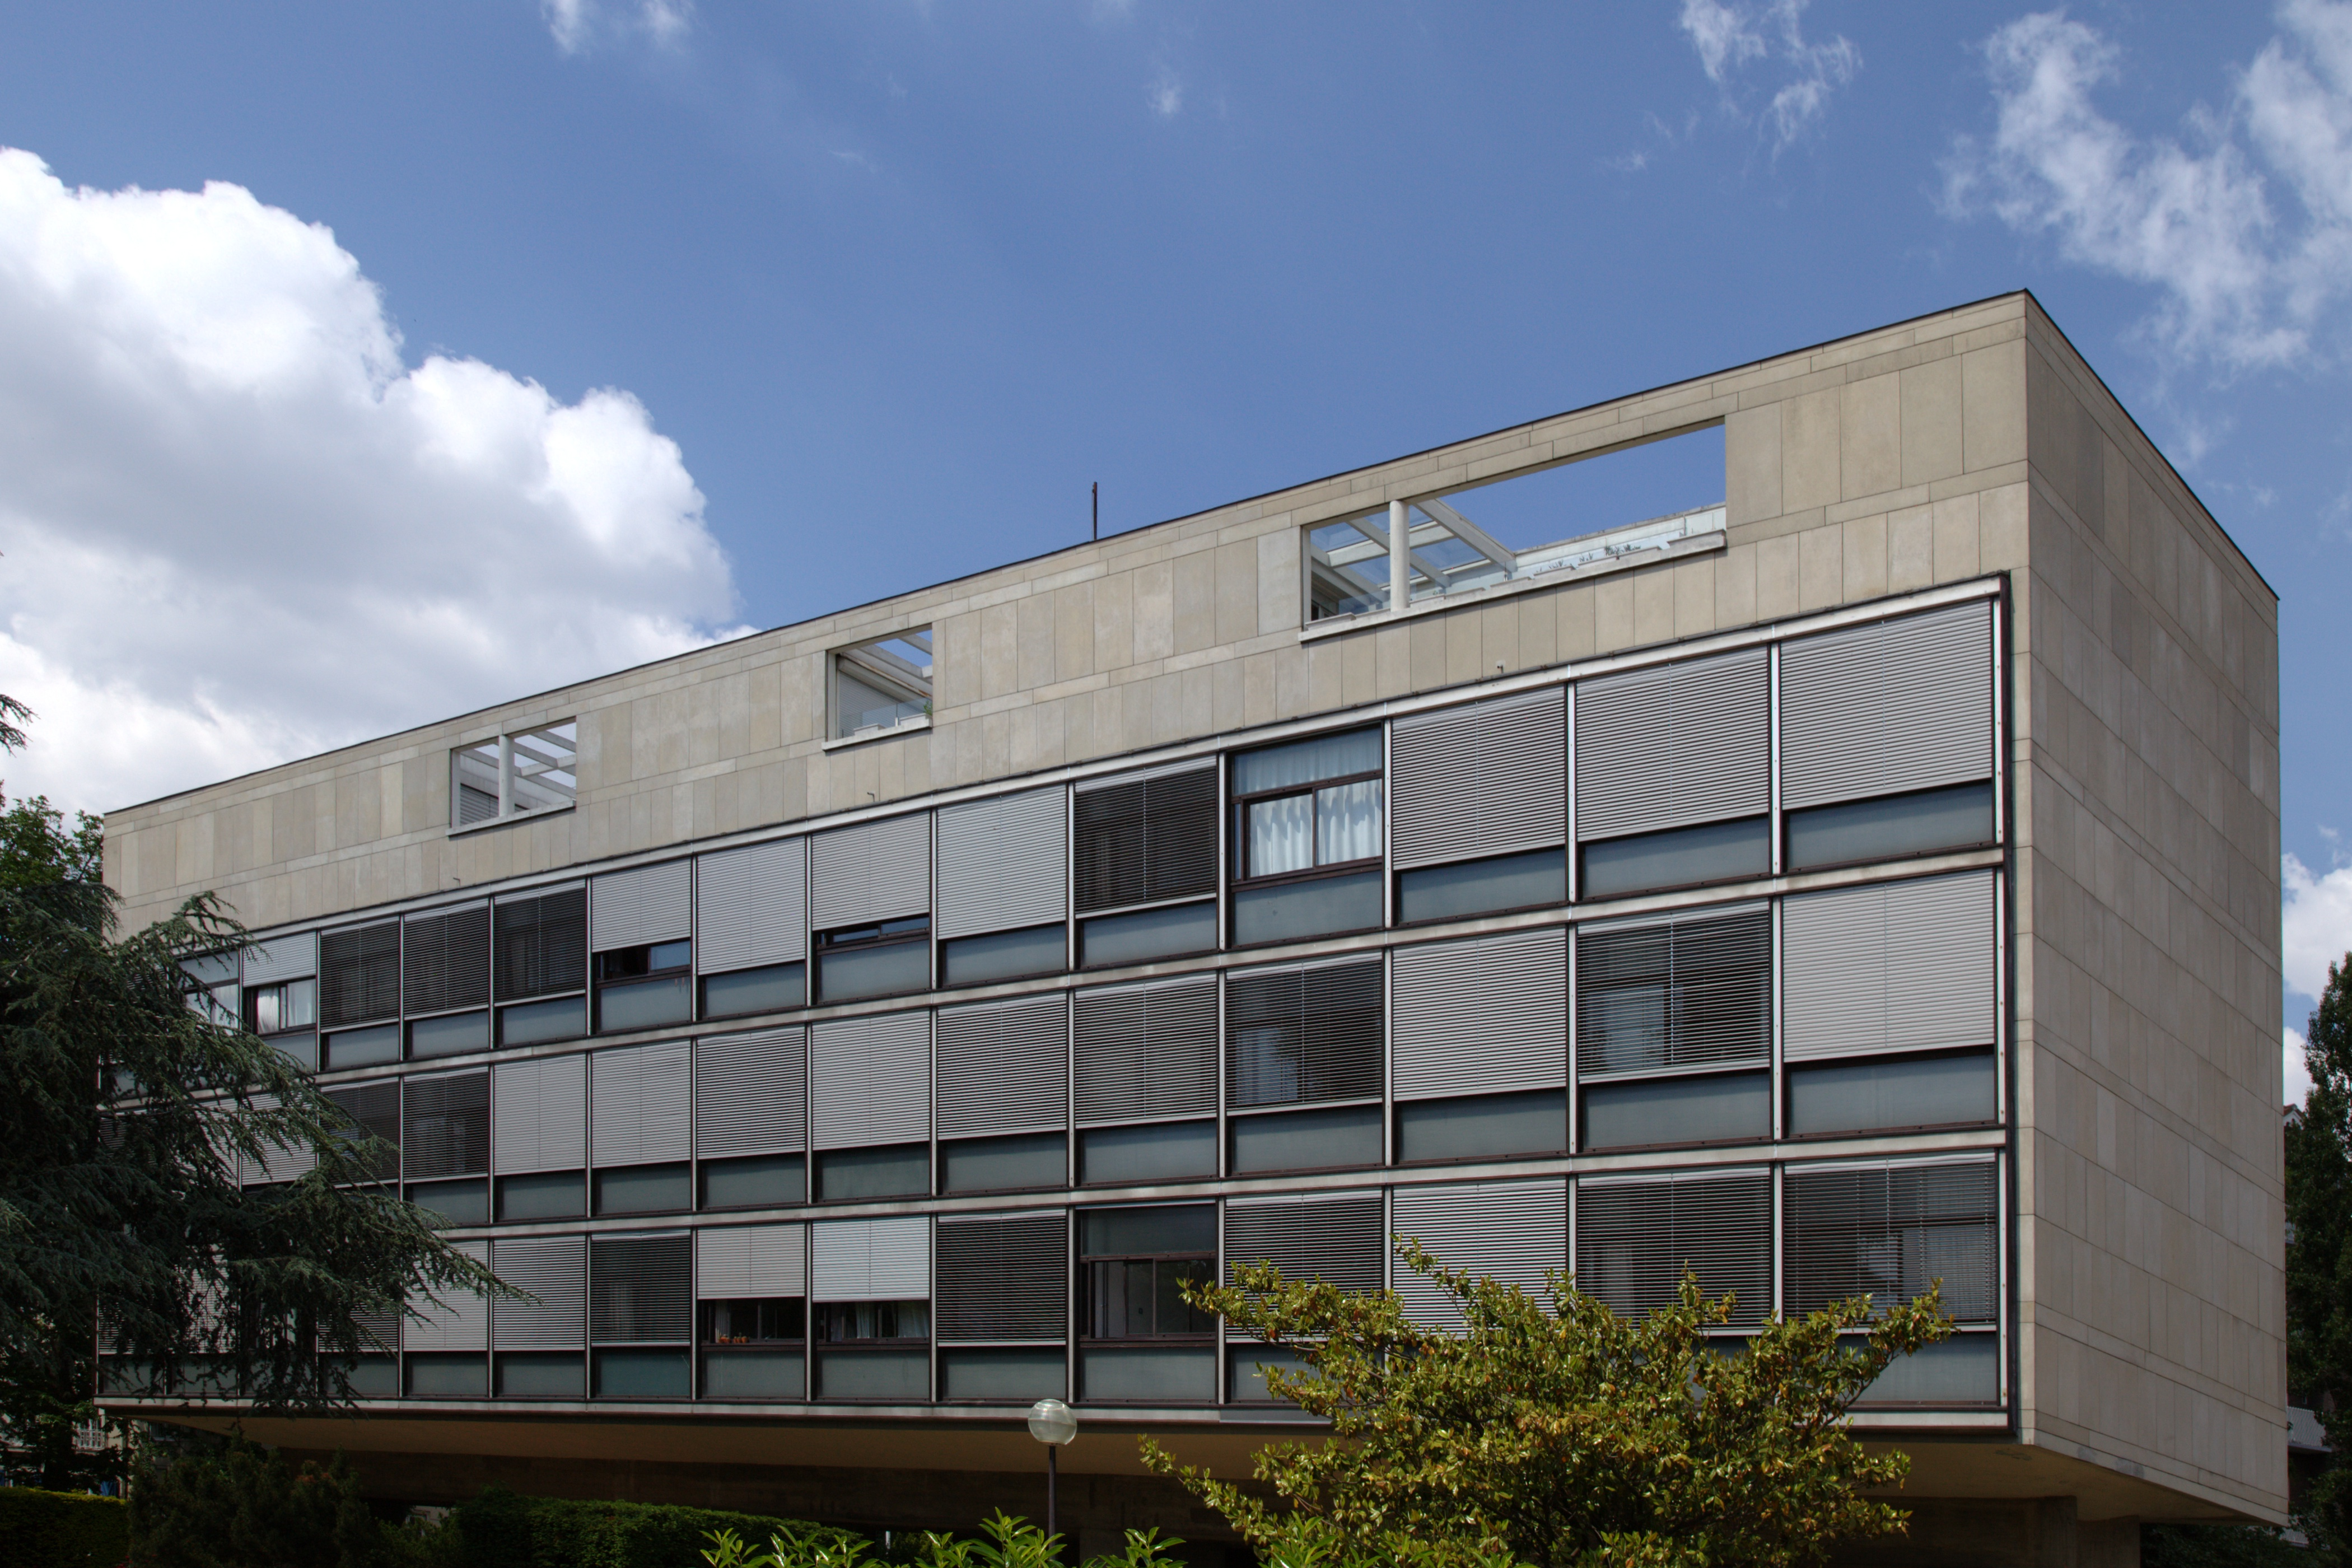 Fondation Suisse vue de la façade Sud